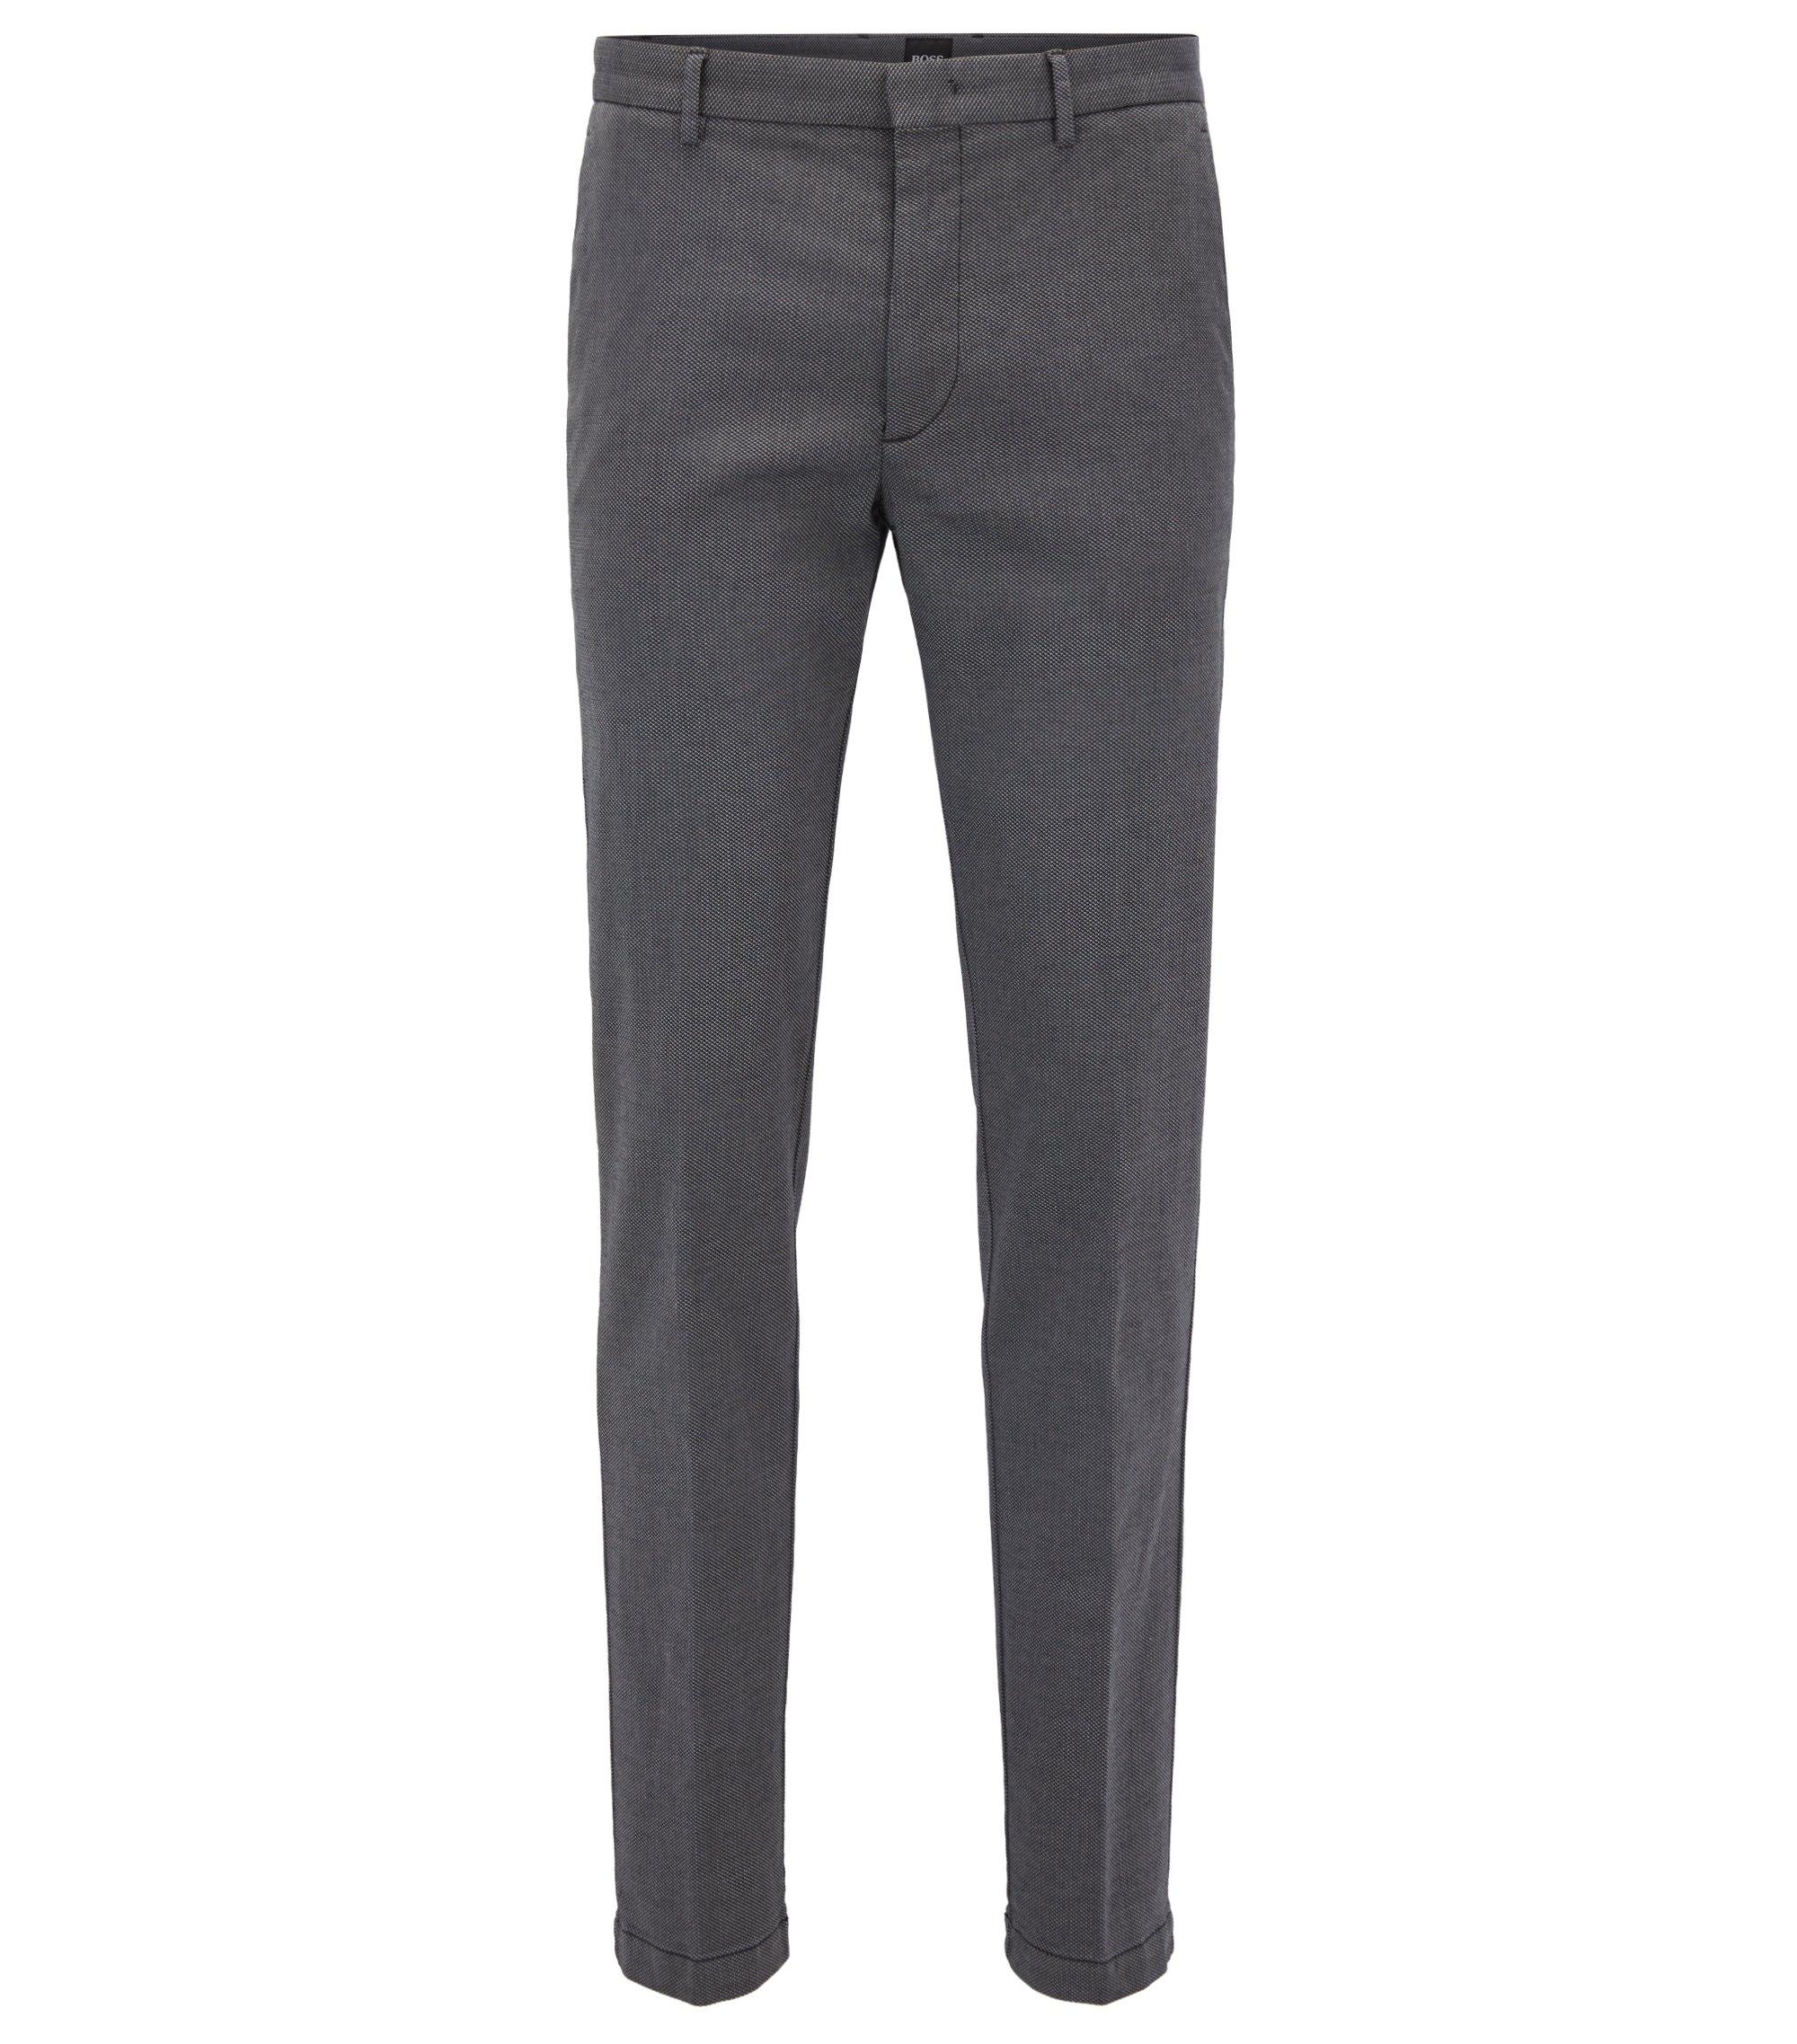 Stretch Cotton Pant, Slim Fit | Kaito W, Dark Grey